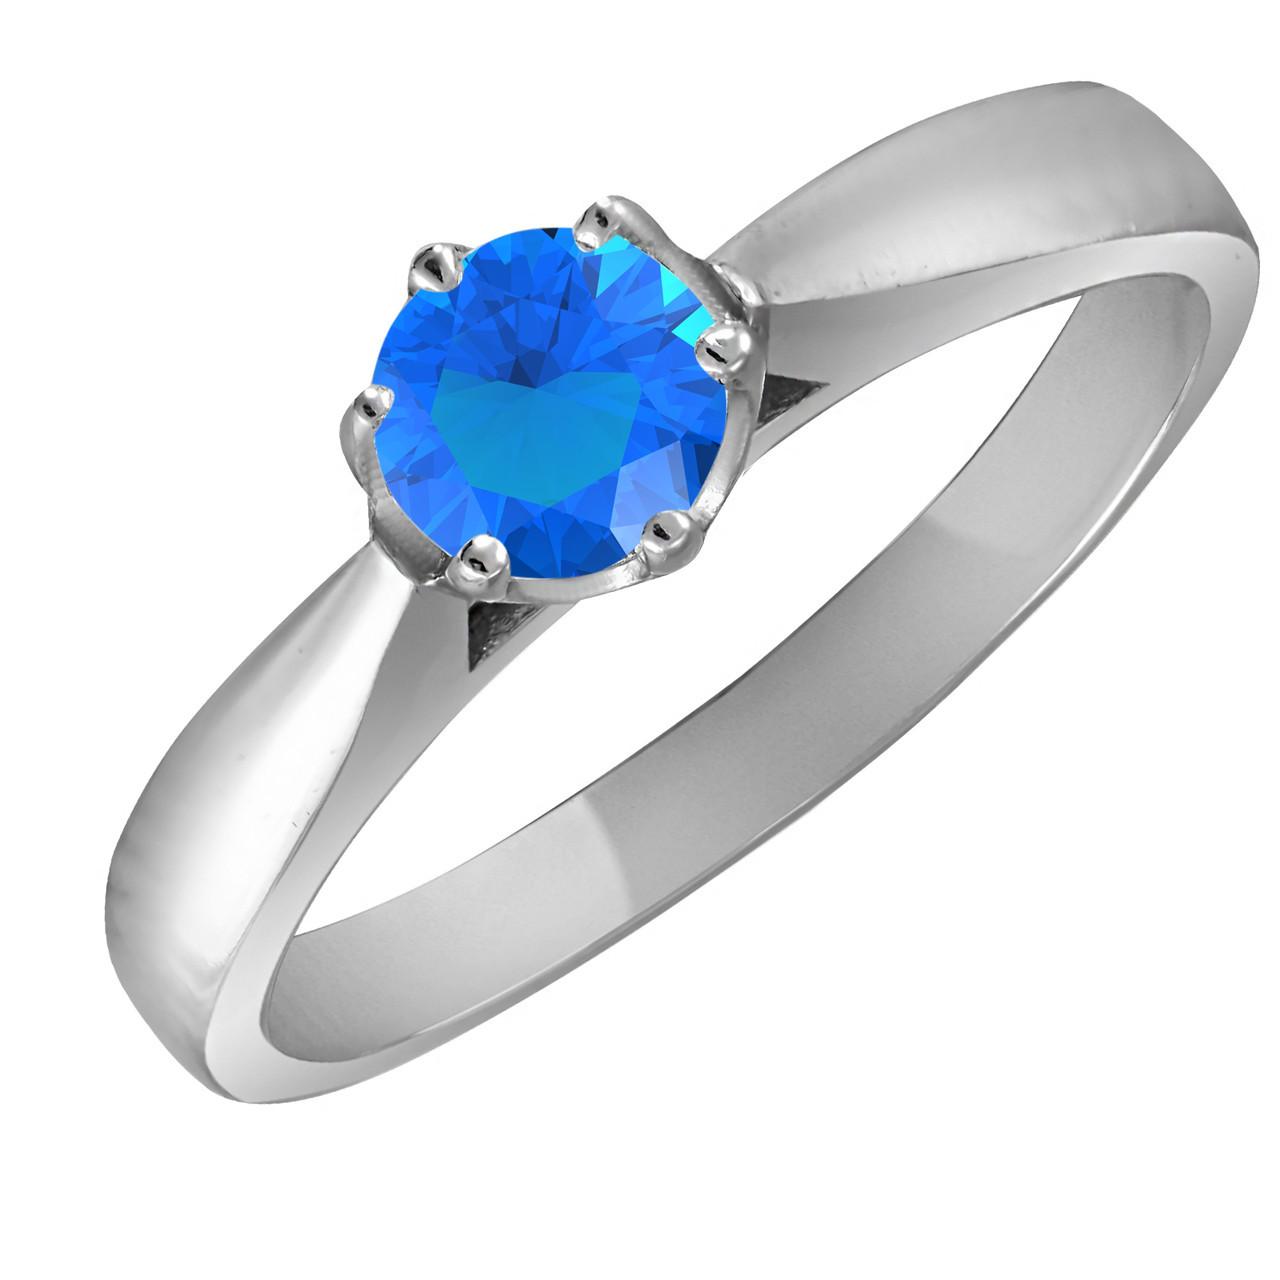 Кольцо из серебра с голубым кубическим цирконием Twiddle Jewelry 20.5 размер (К015г-20.5)